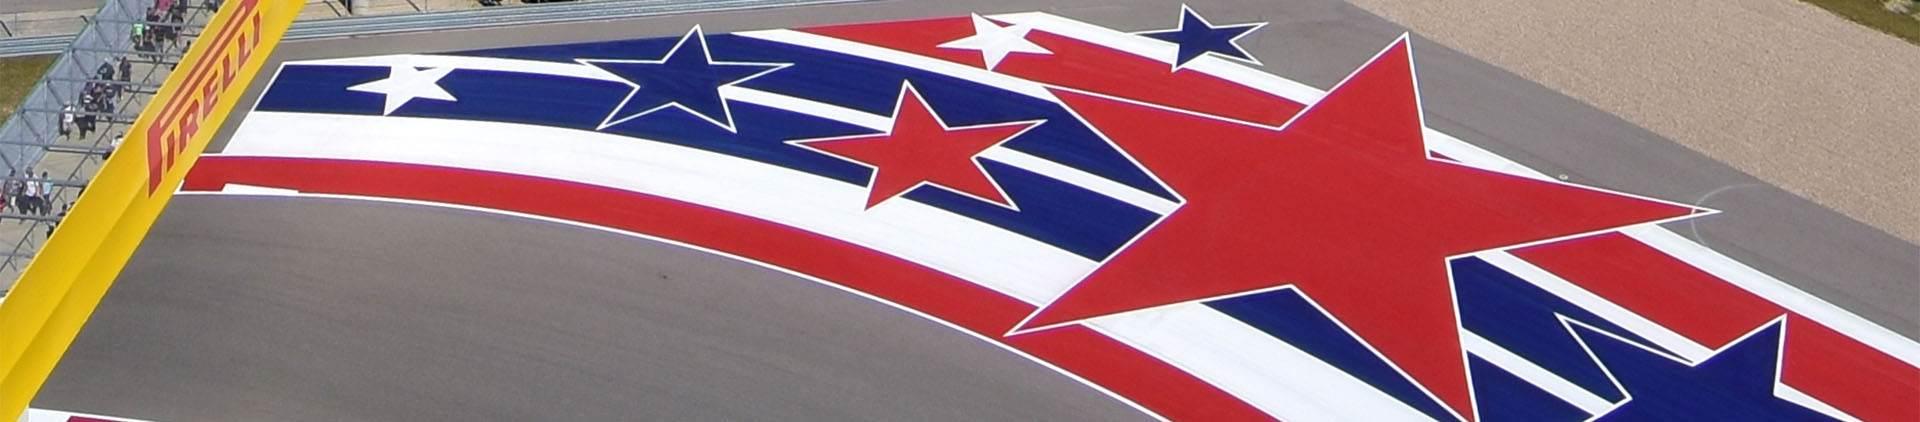 F1 Stati Uniti